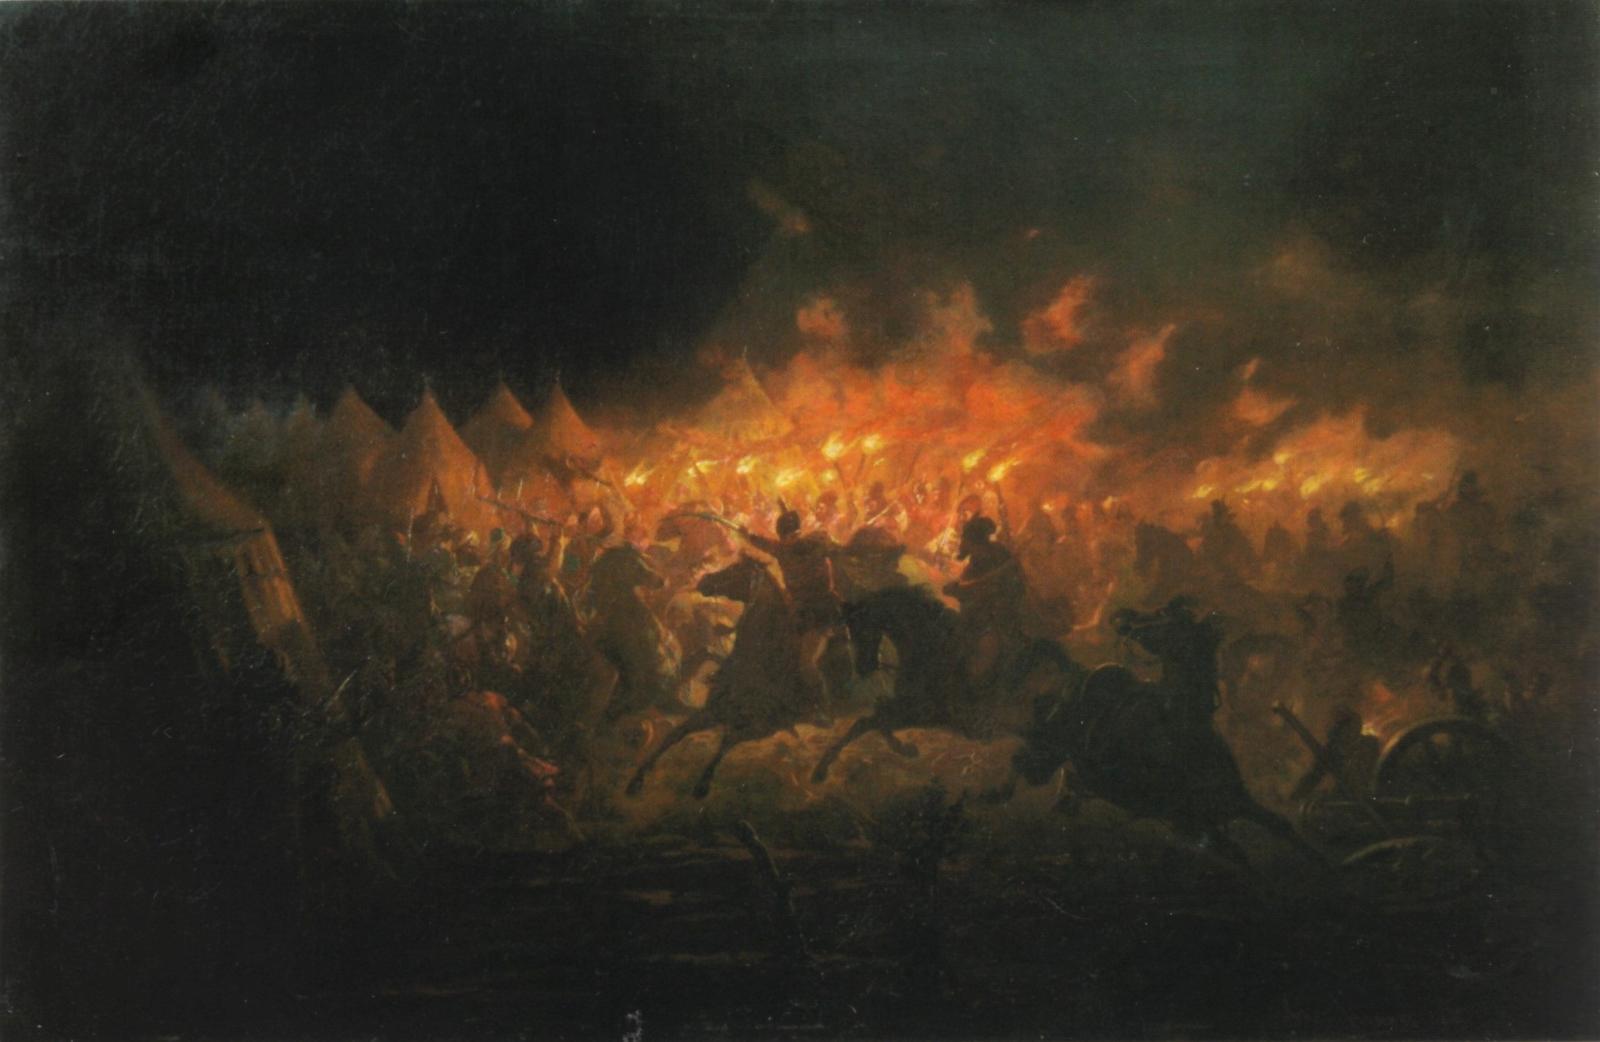 Налёт валахов на лагерь султана. Т. Аман. Источник: wikipedia.org